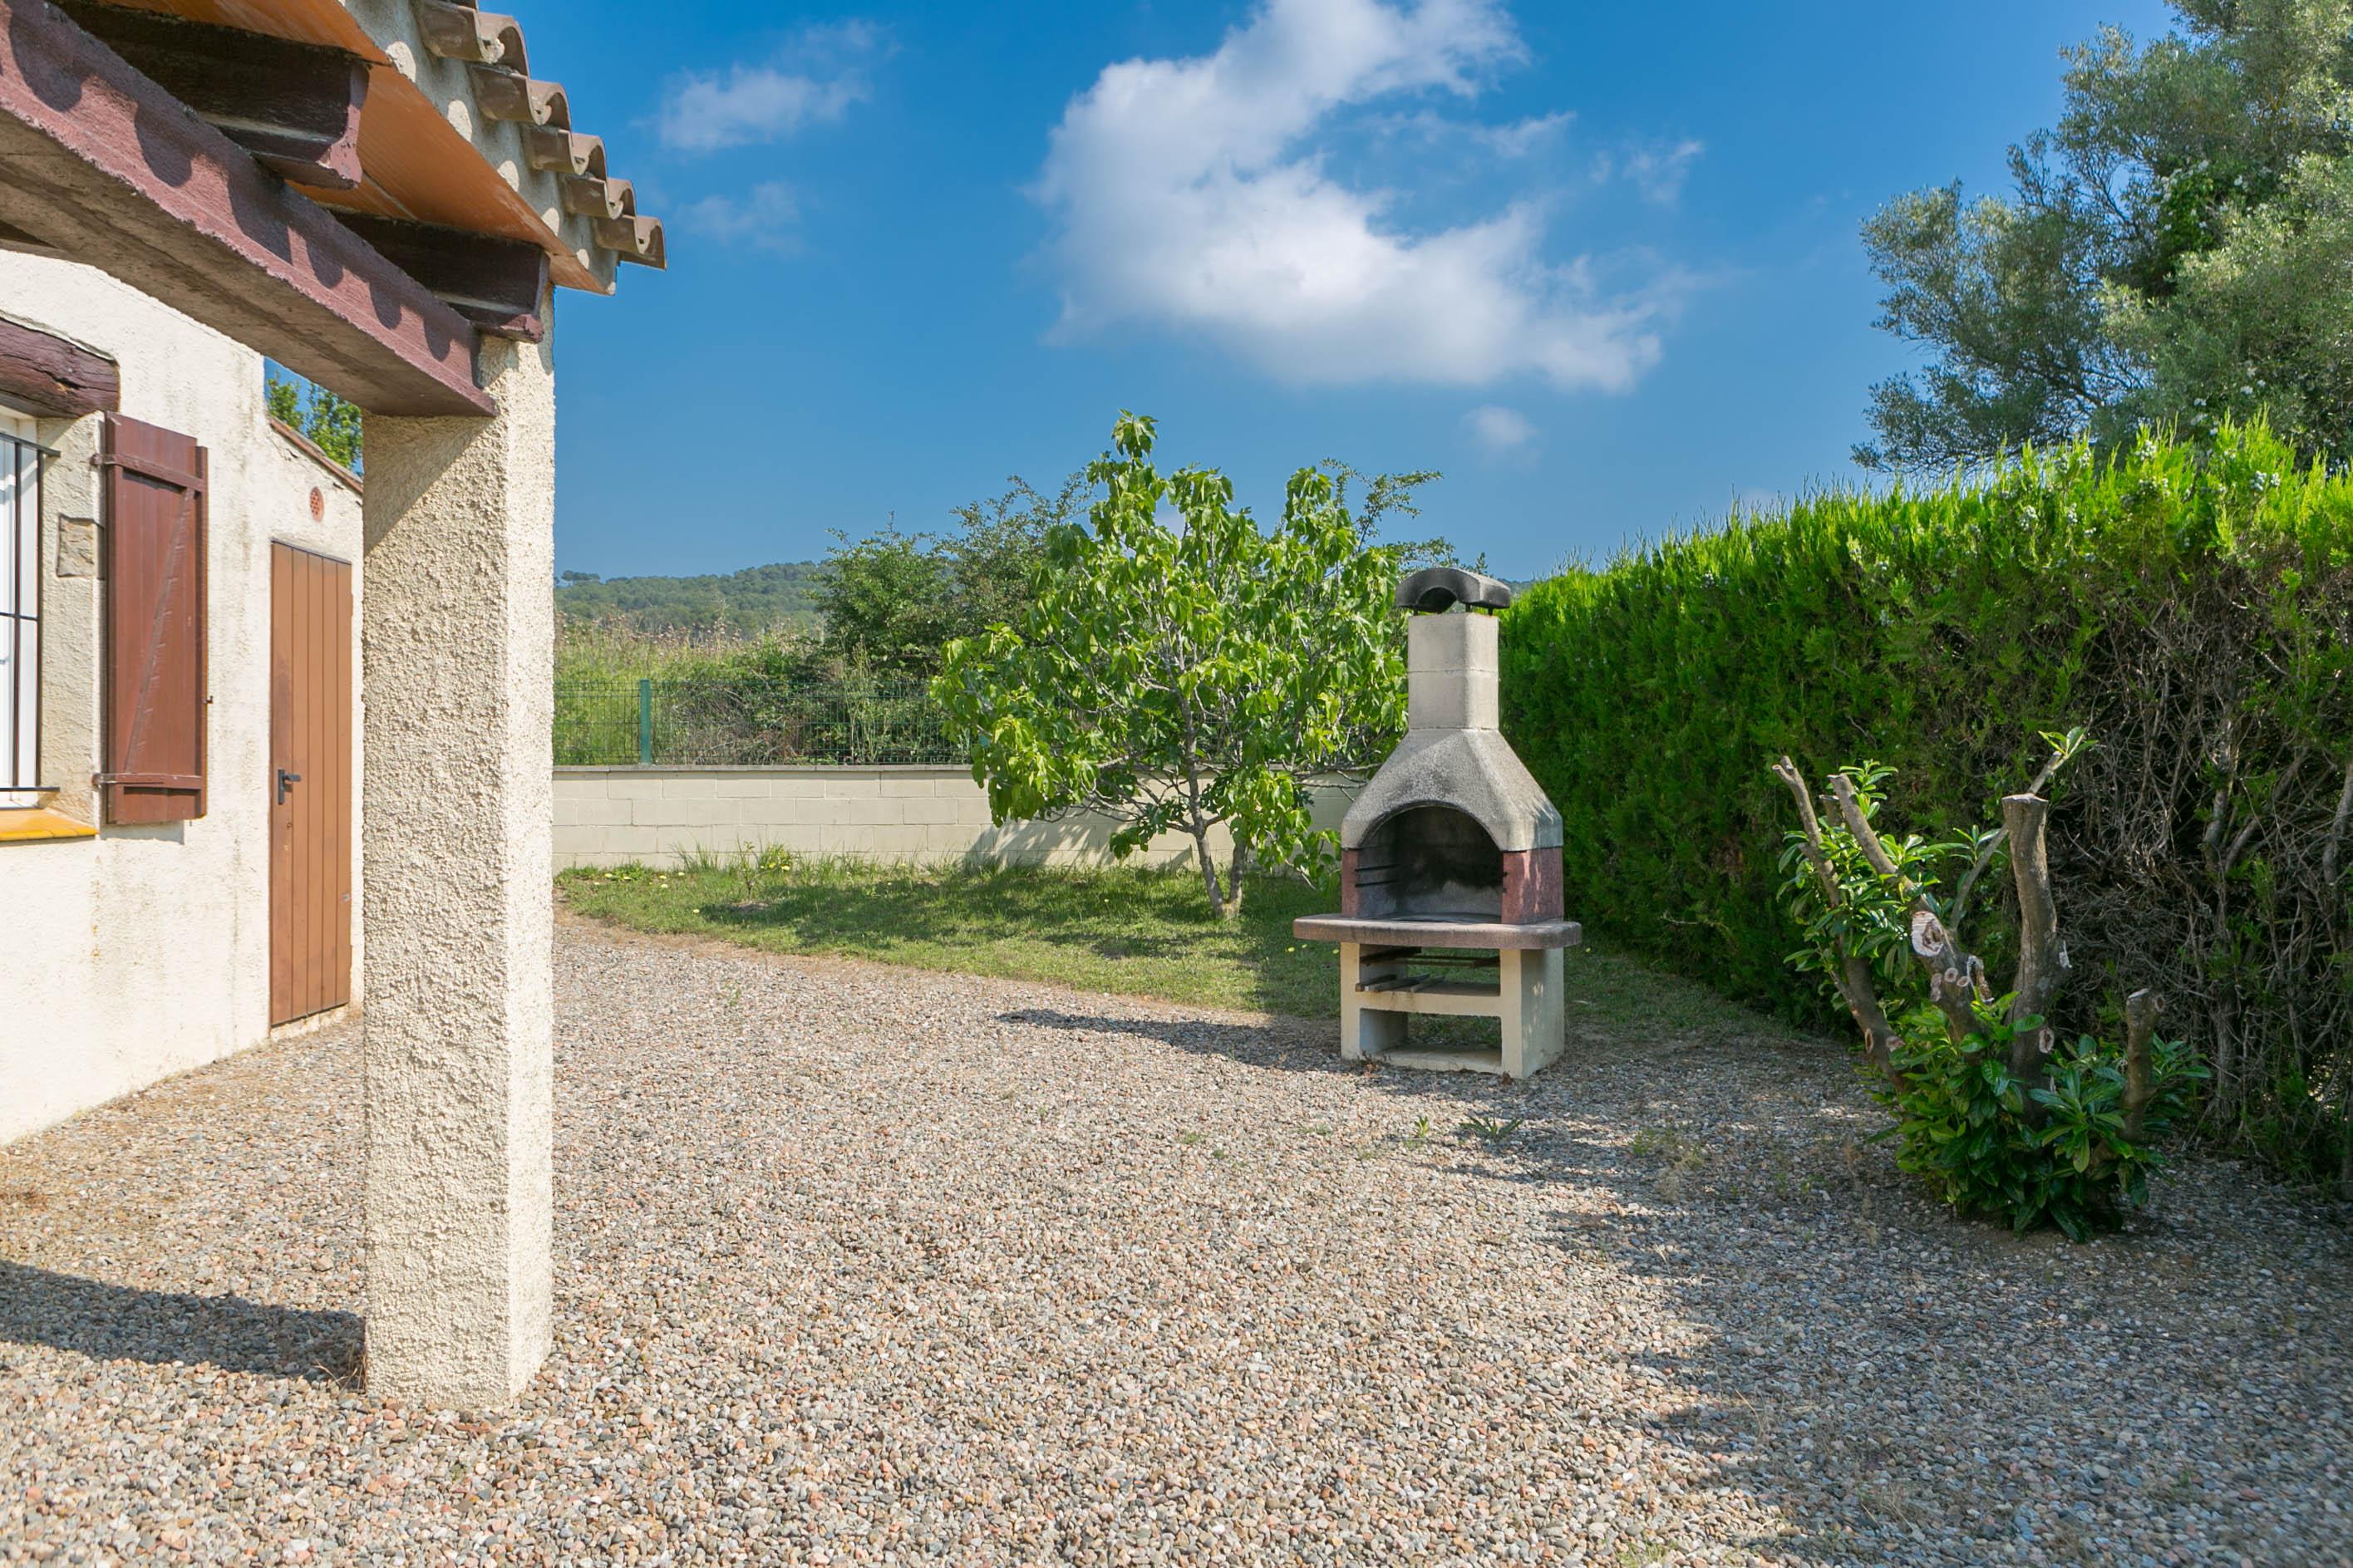 2 bedroom semi-detached house in Urb. Torre Gran, L'Estartit. Garden and community pool (Ref:H38) 4